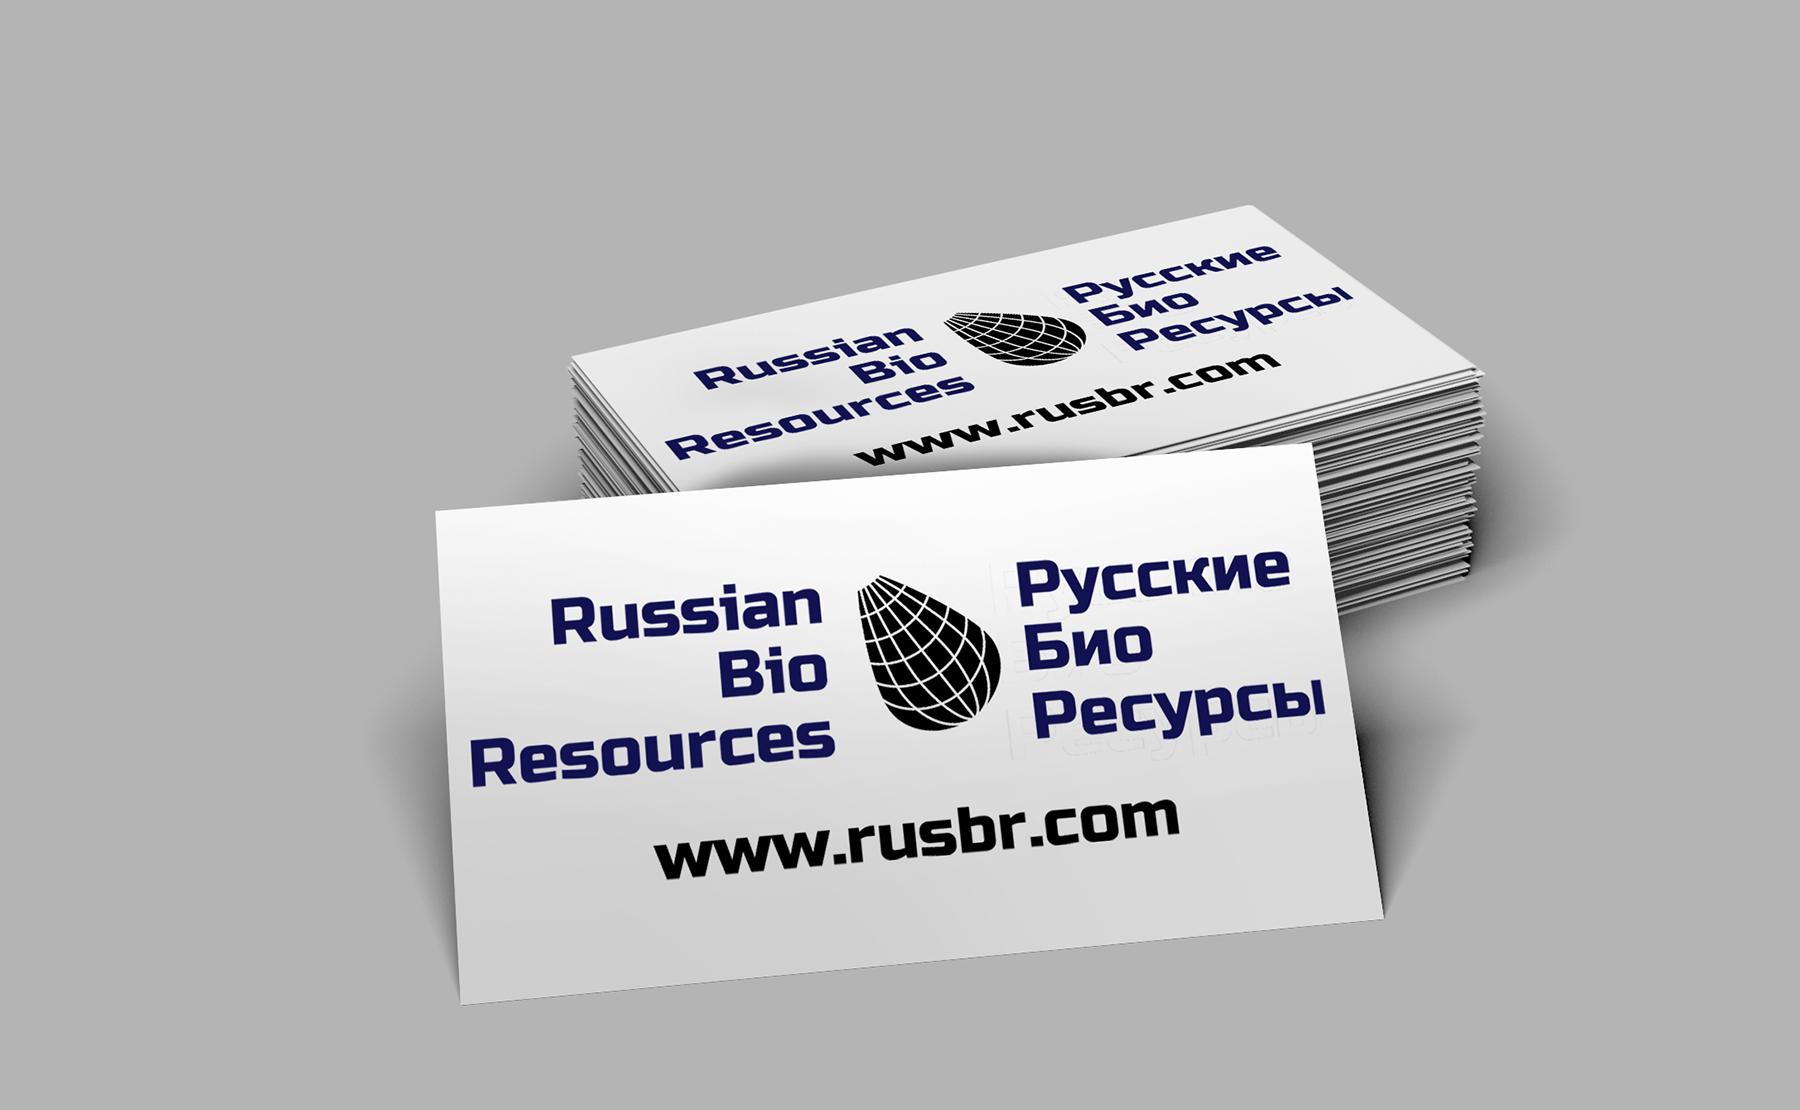 Разработка логотипа для компании «Русские Био Ресурсы» фото f_71058fcf35b544d9.png